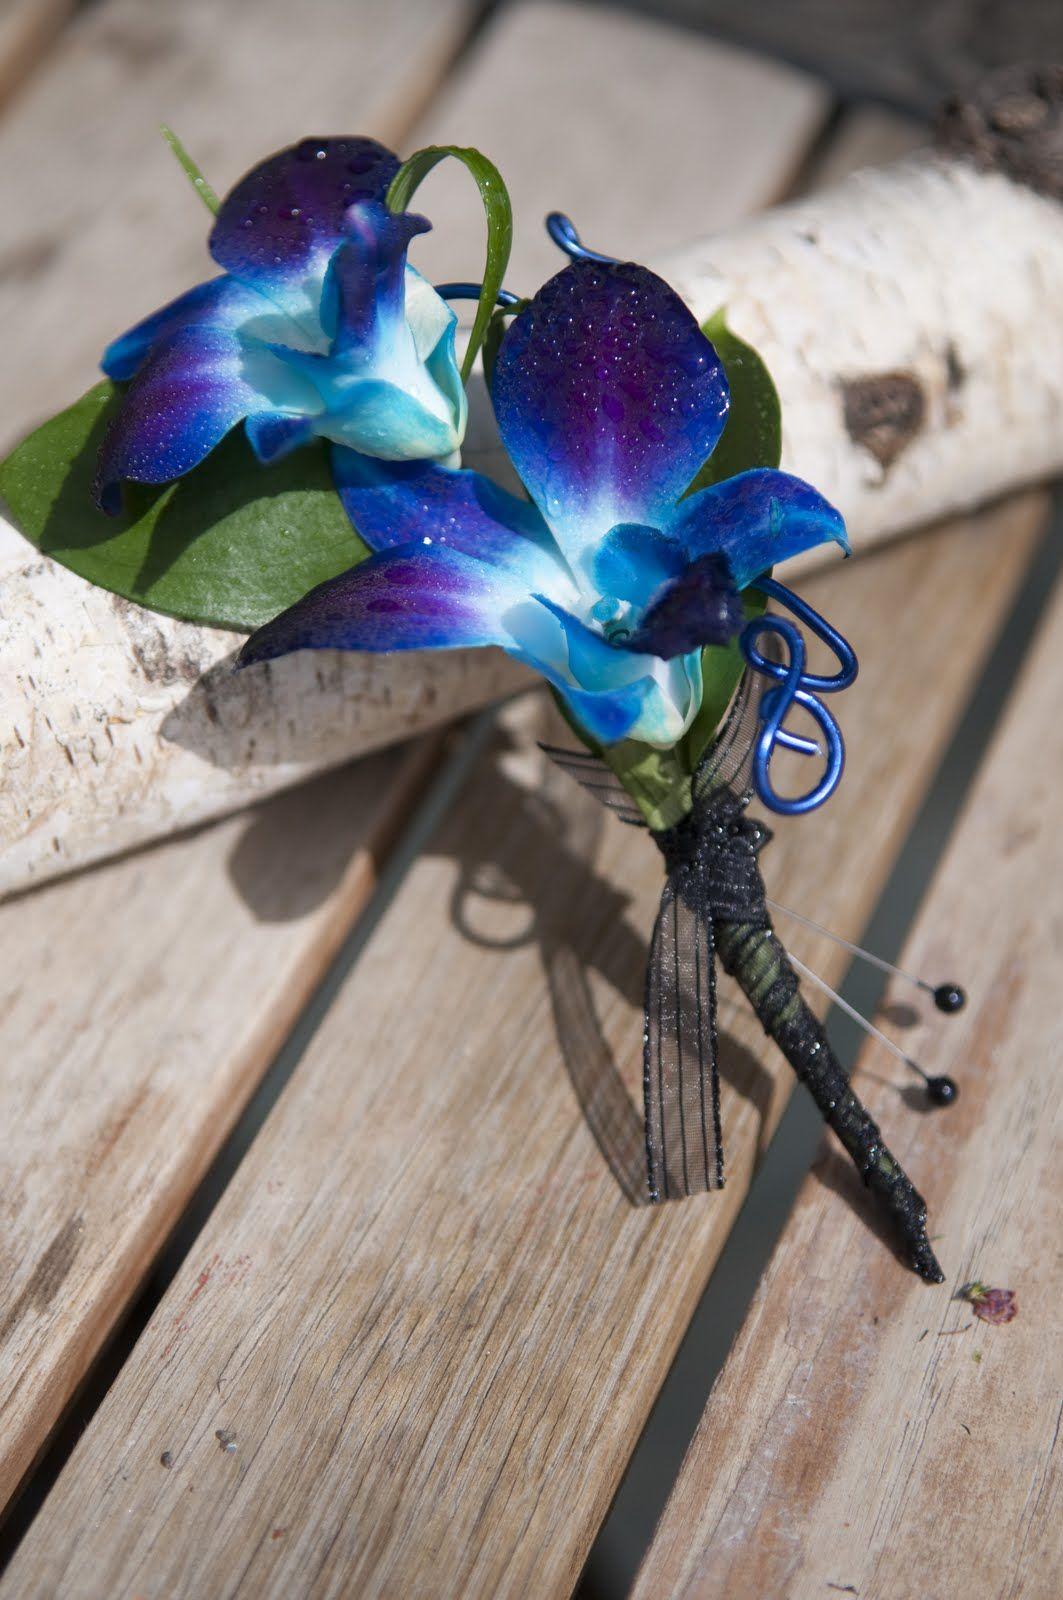 Blue dendrobium orchids prom flowers custom designed in evergreen